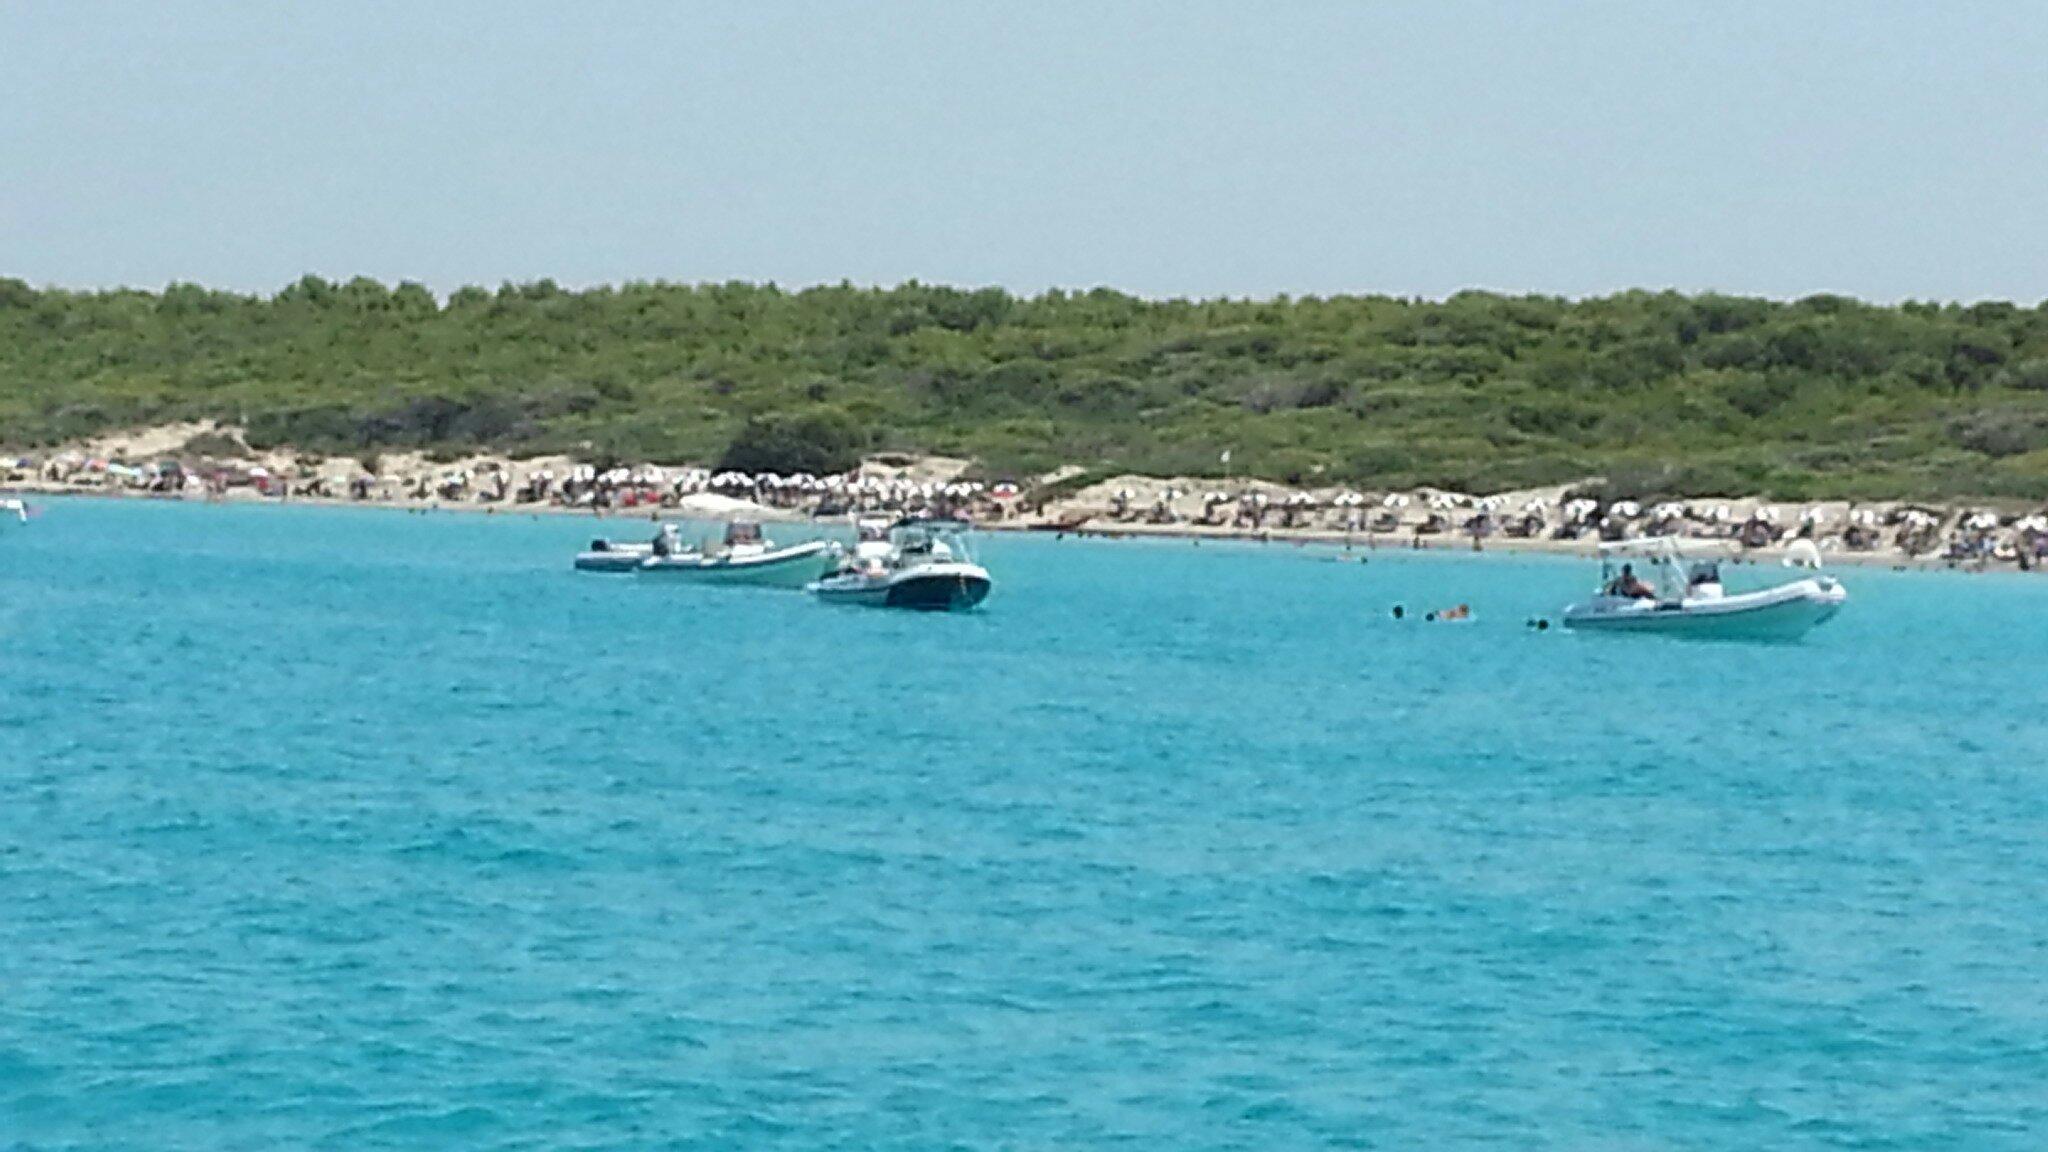 Marina Yachting Portolano - Day Excursions & Boat Rentals